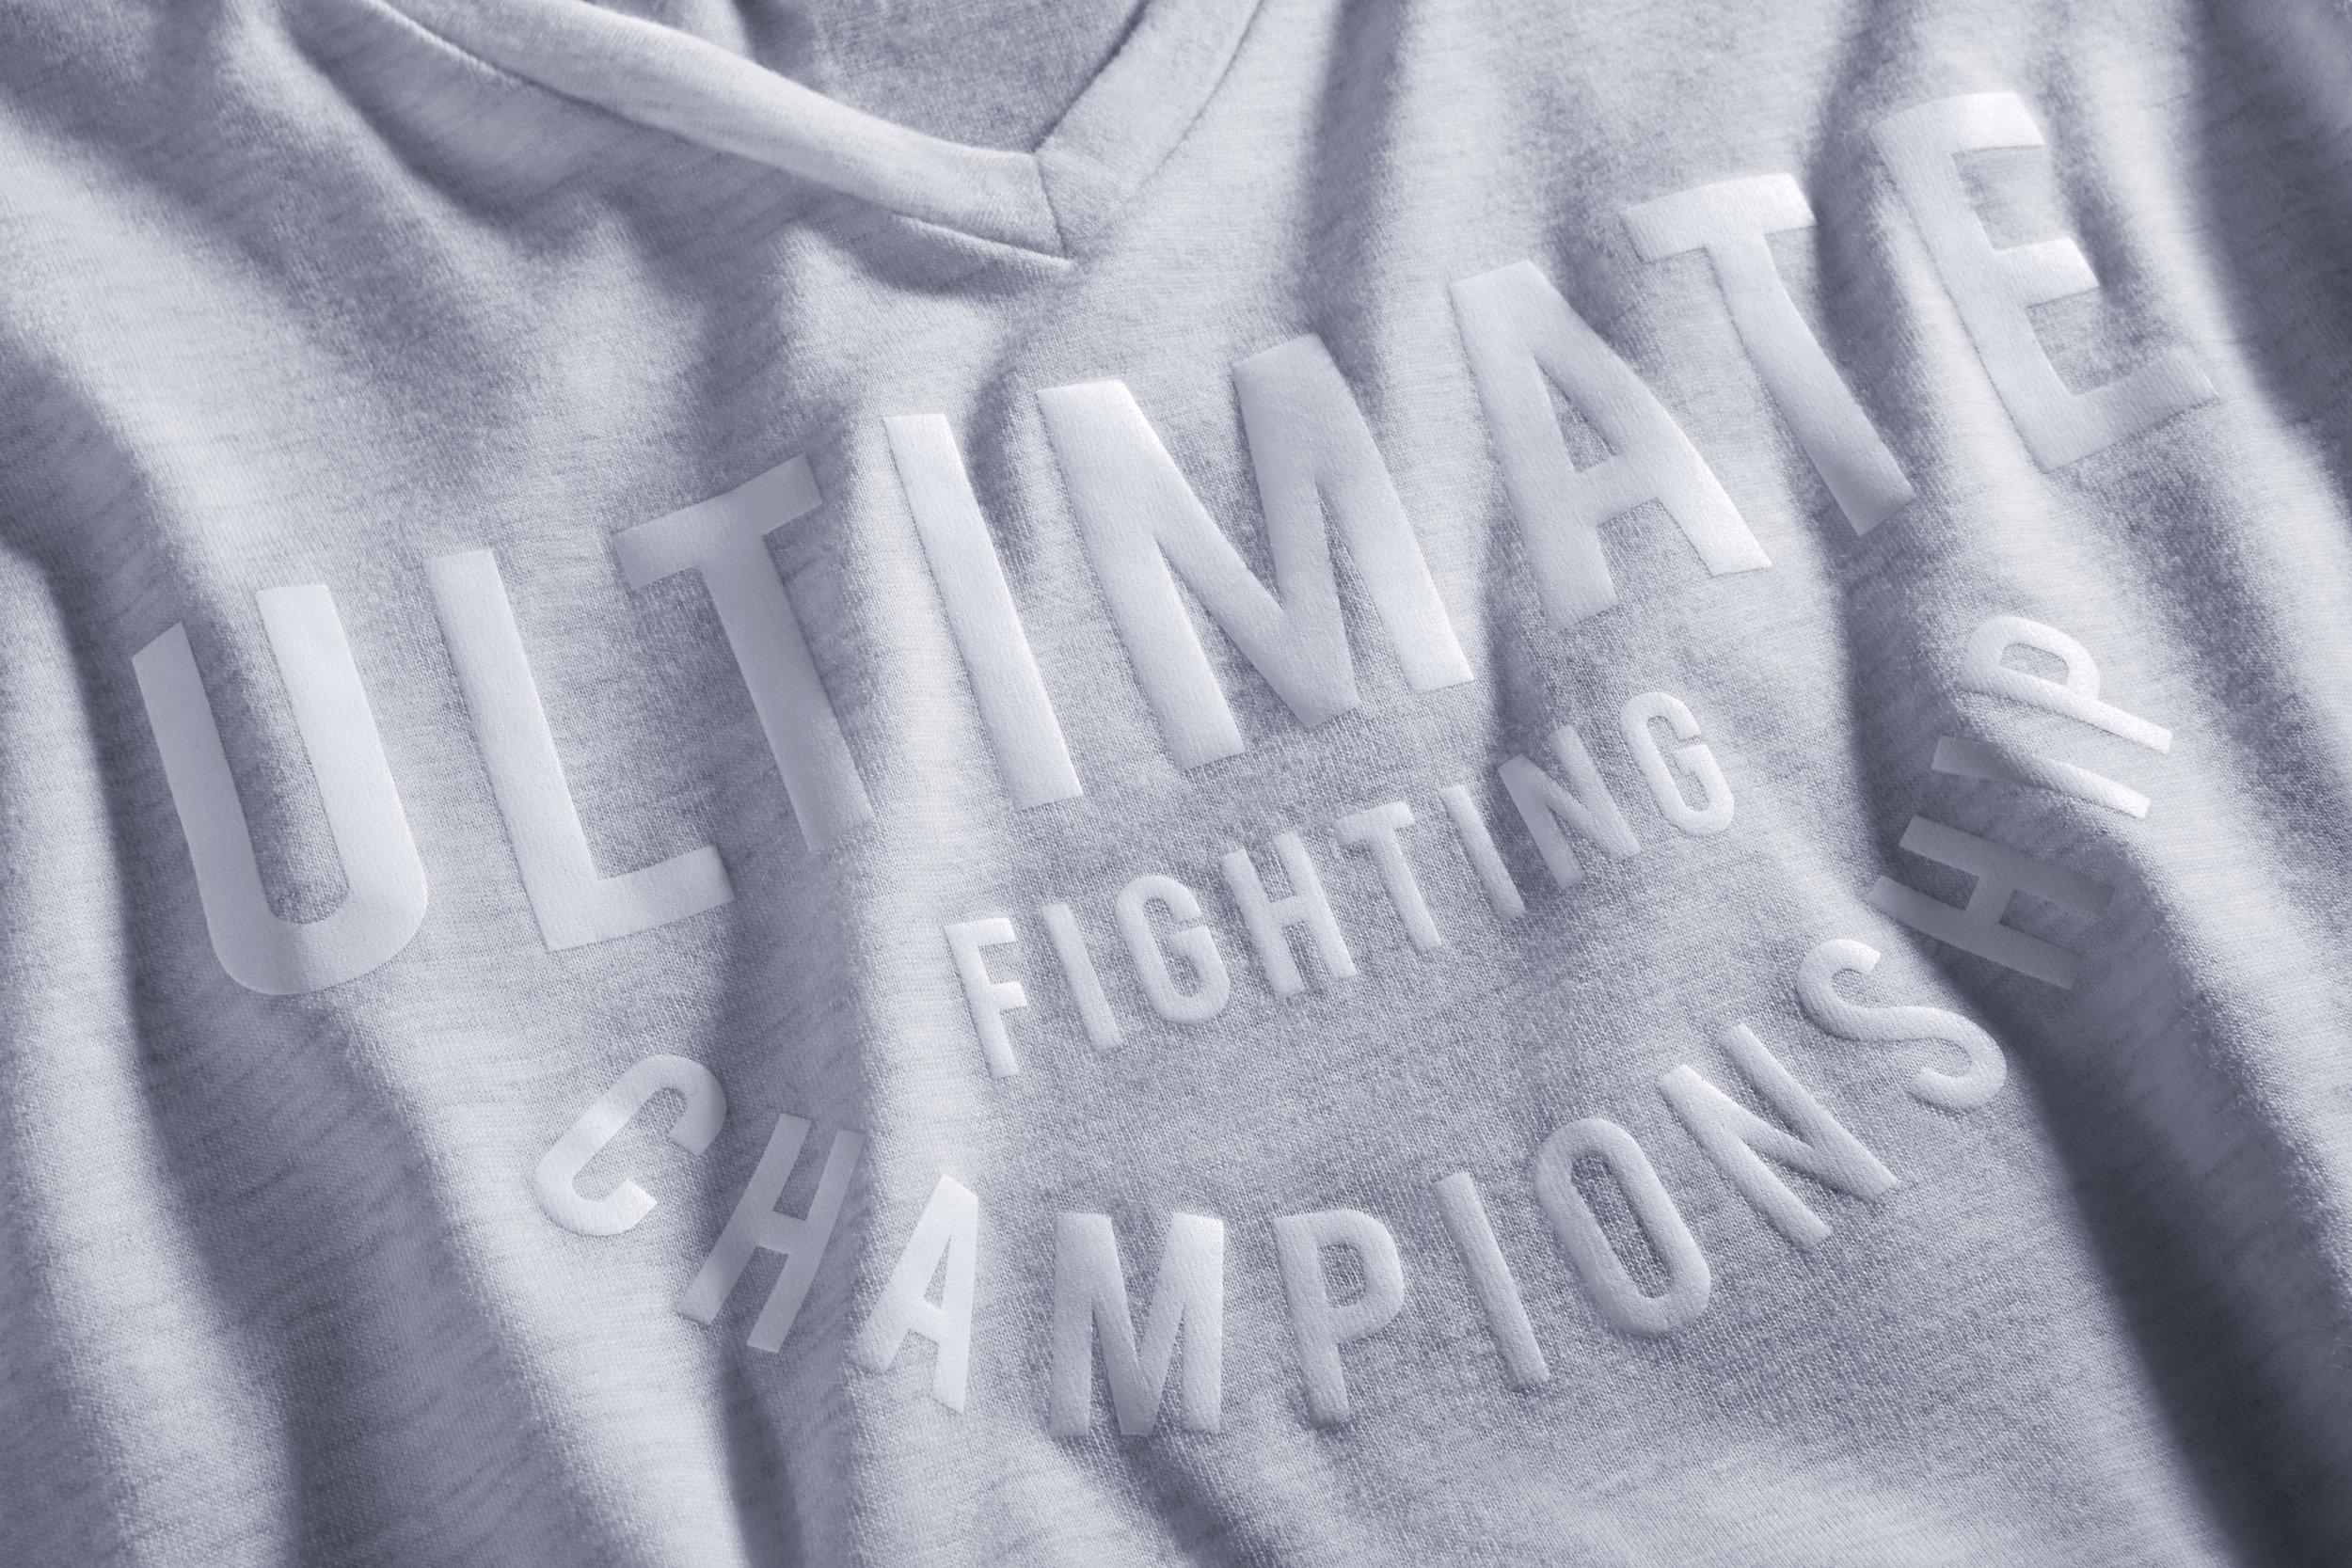 C21101_FW17_UFC_FNC_Tee_White_Chest_Detail.jpg